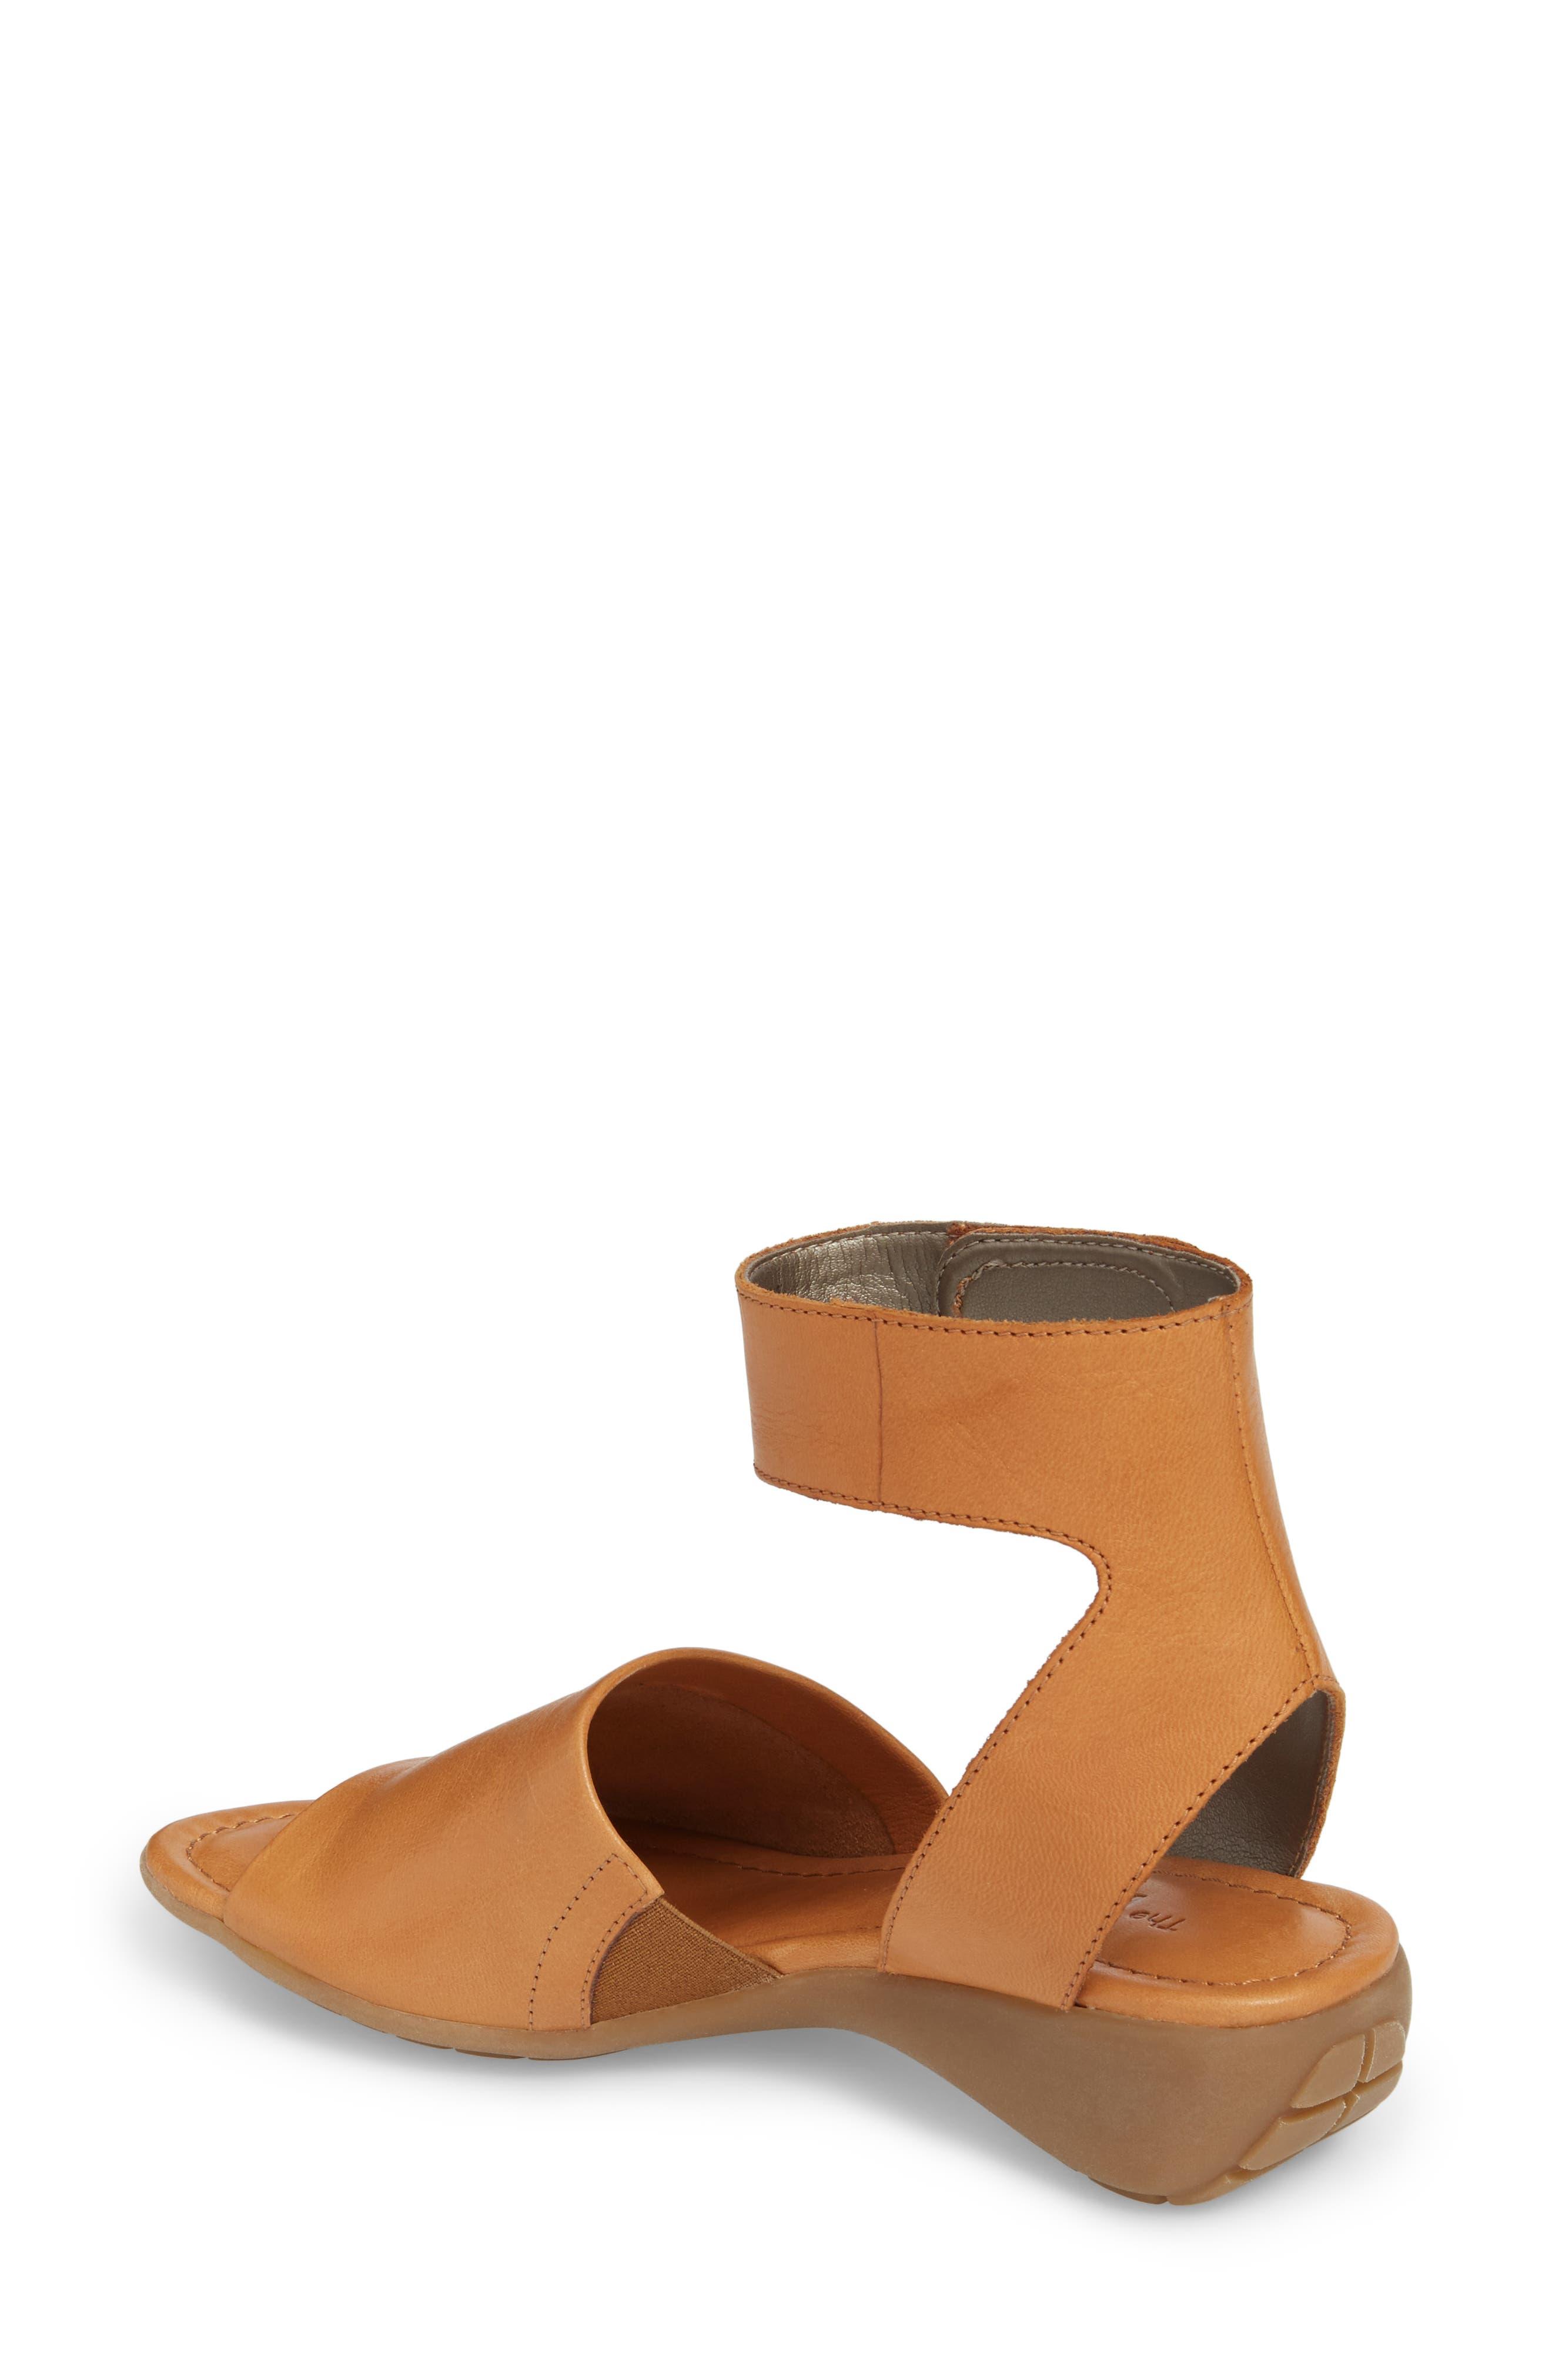 'Beglad' Leather Ankle Strap Sandal,                             Alternate thumbnail 19, color,